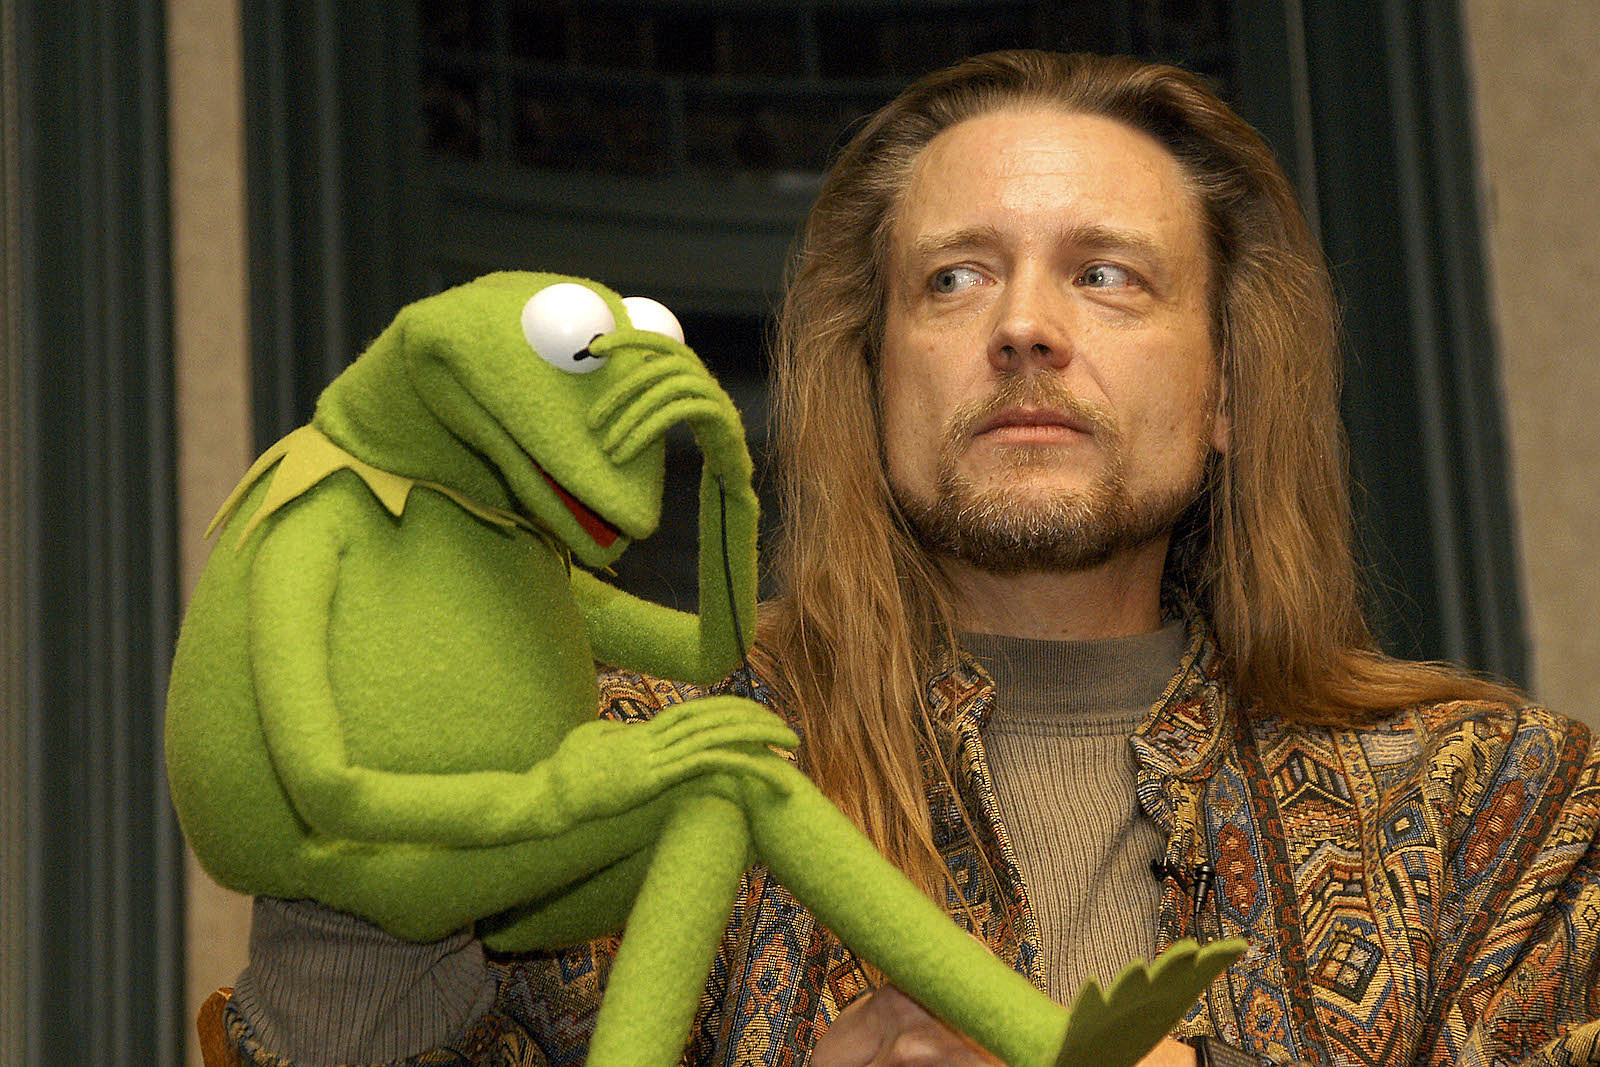 Kermit the Frog Steve Whitmire